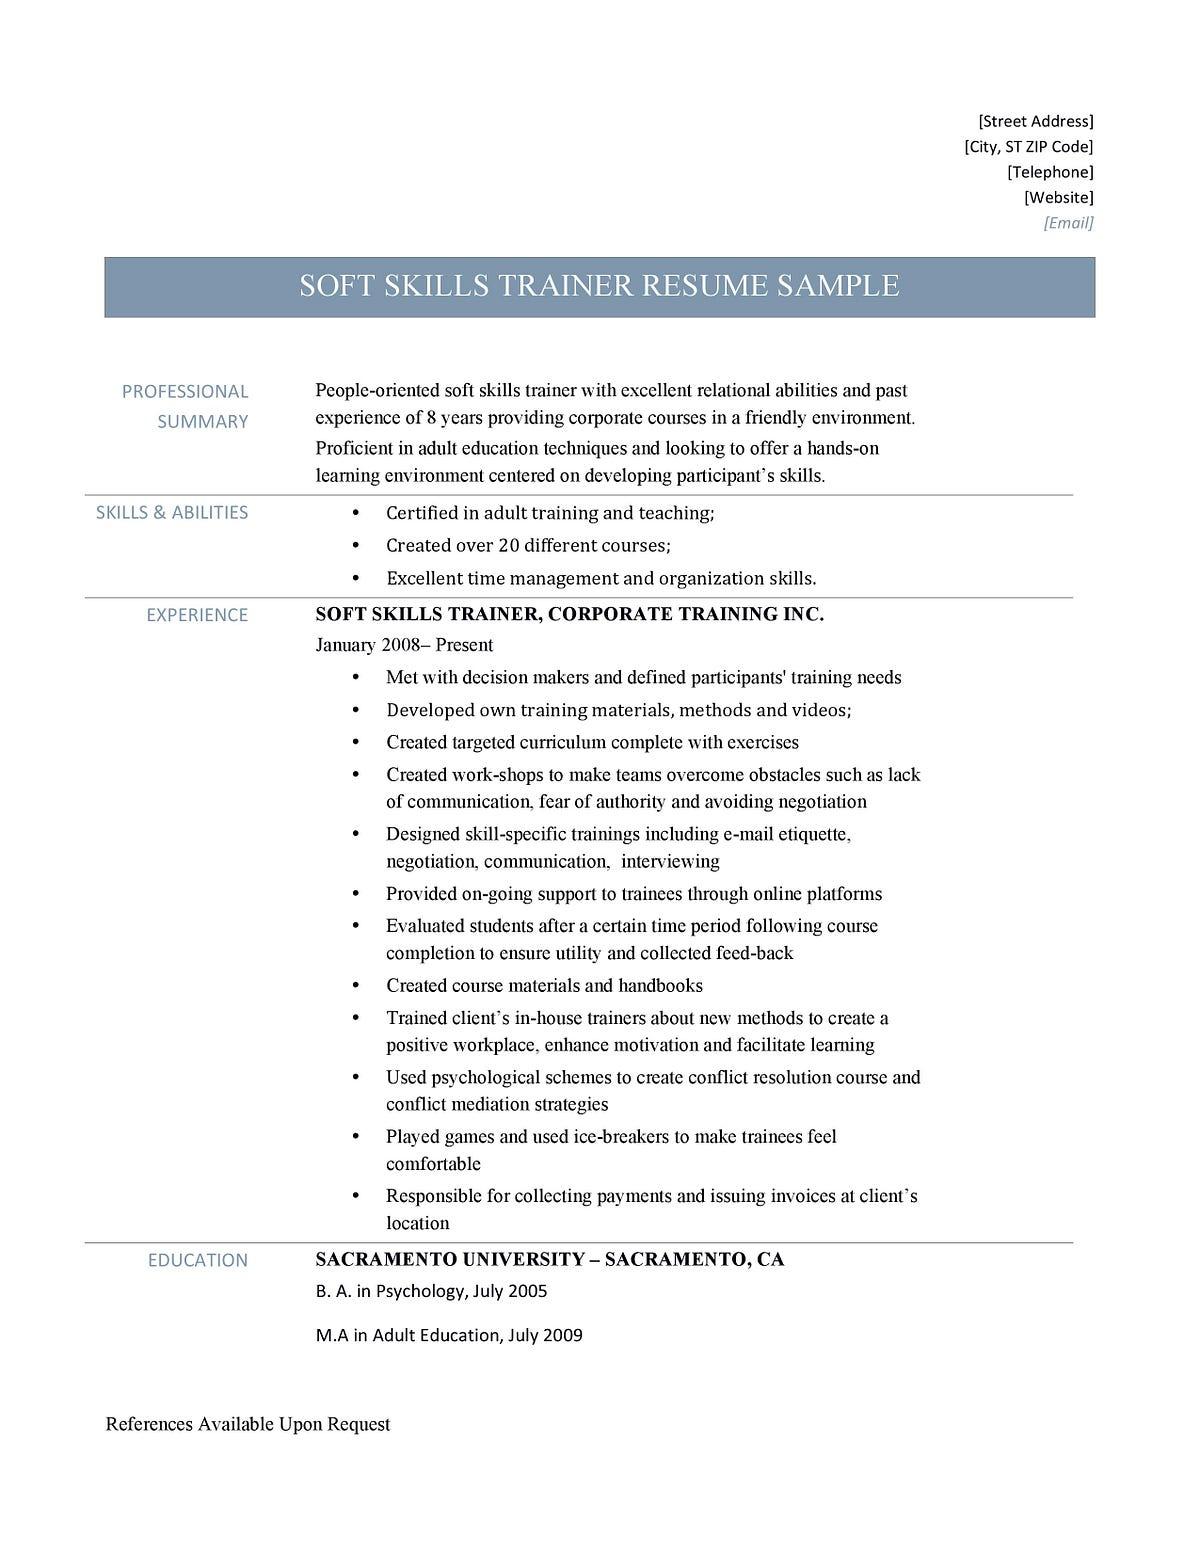 Soft Skills Trainer Resume Samples And Job Description